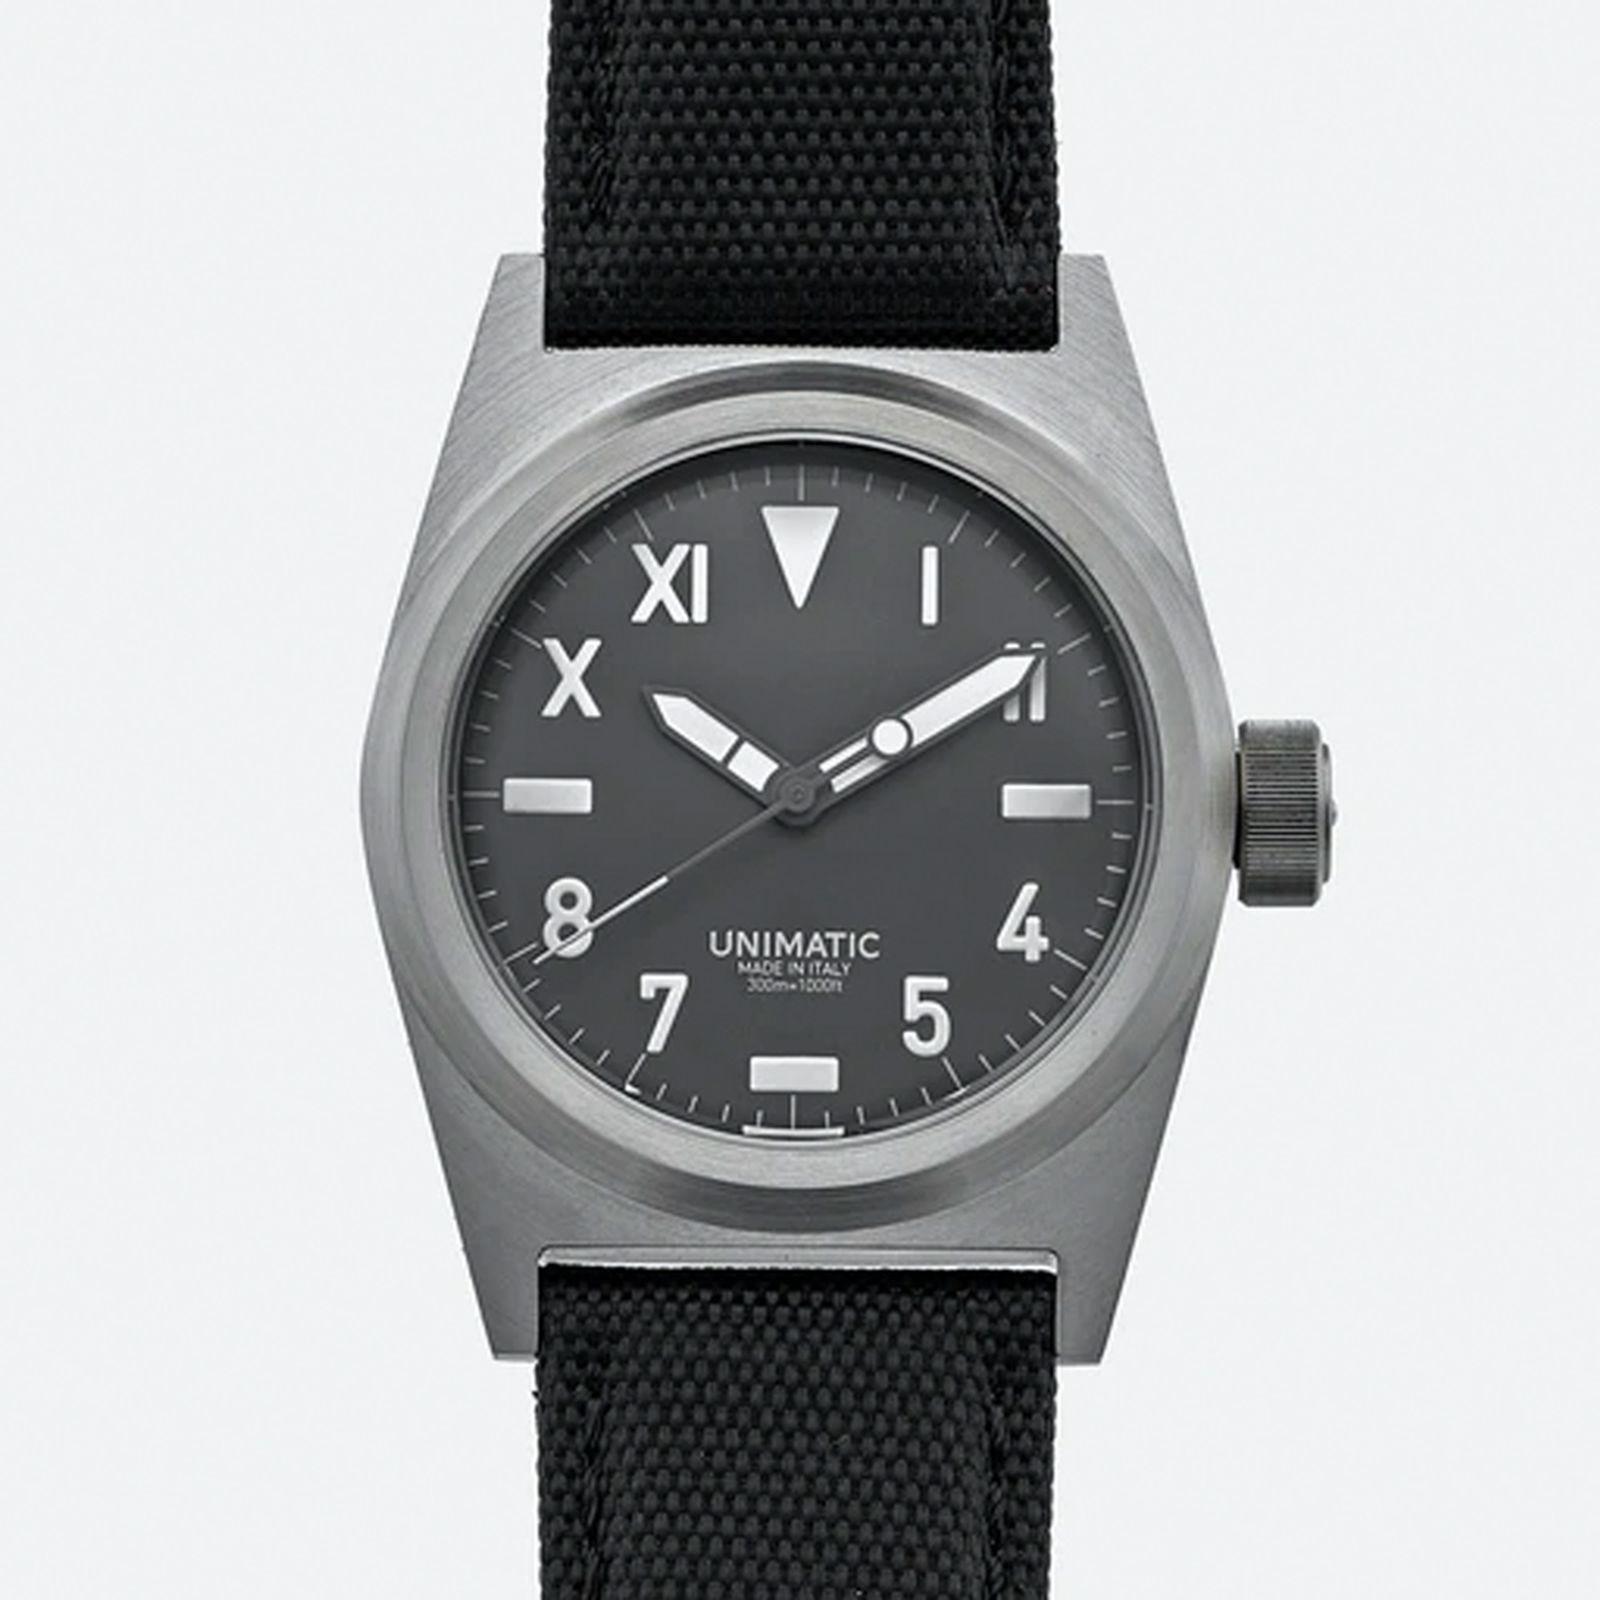 hodinkee-unimatic-price-release-date-01